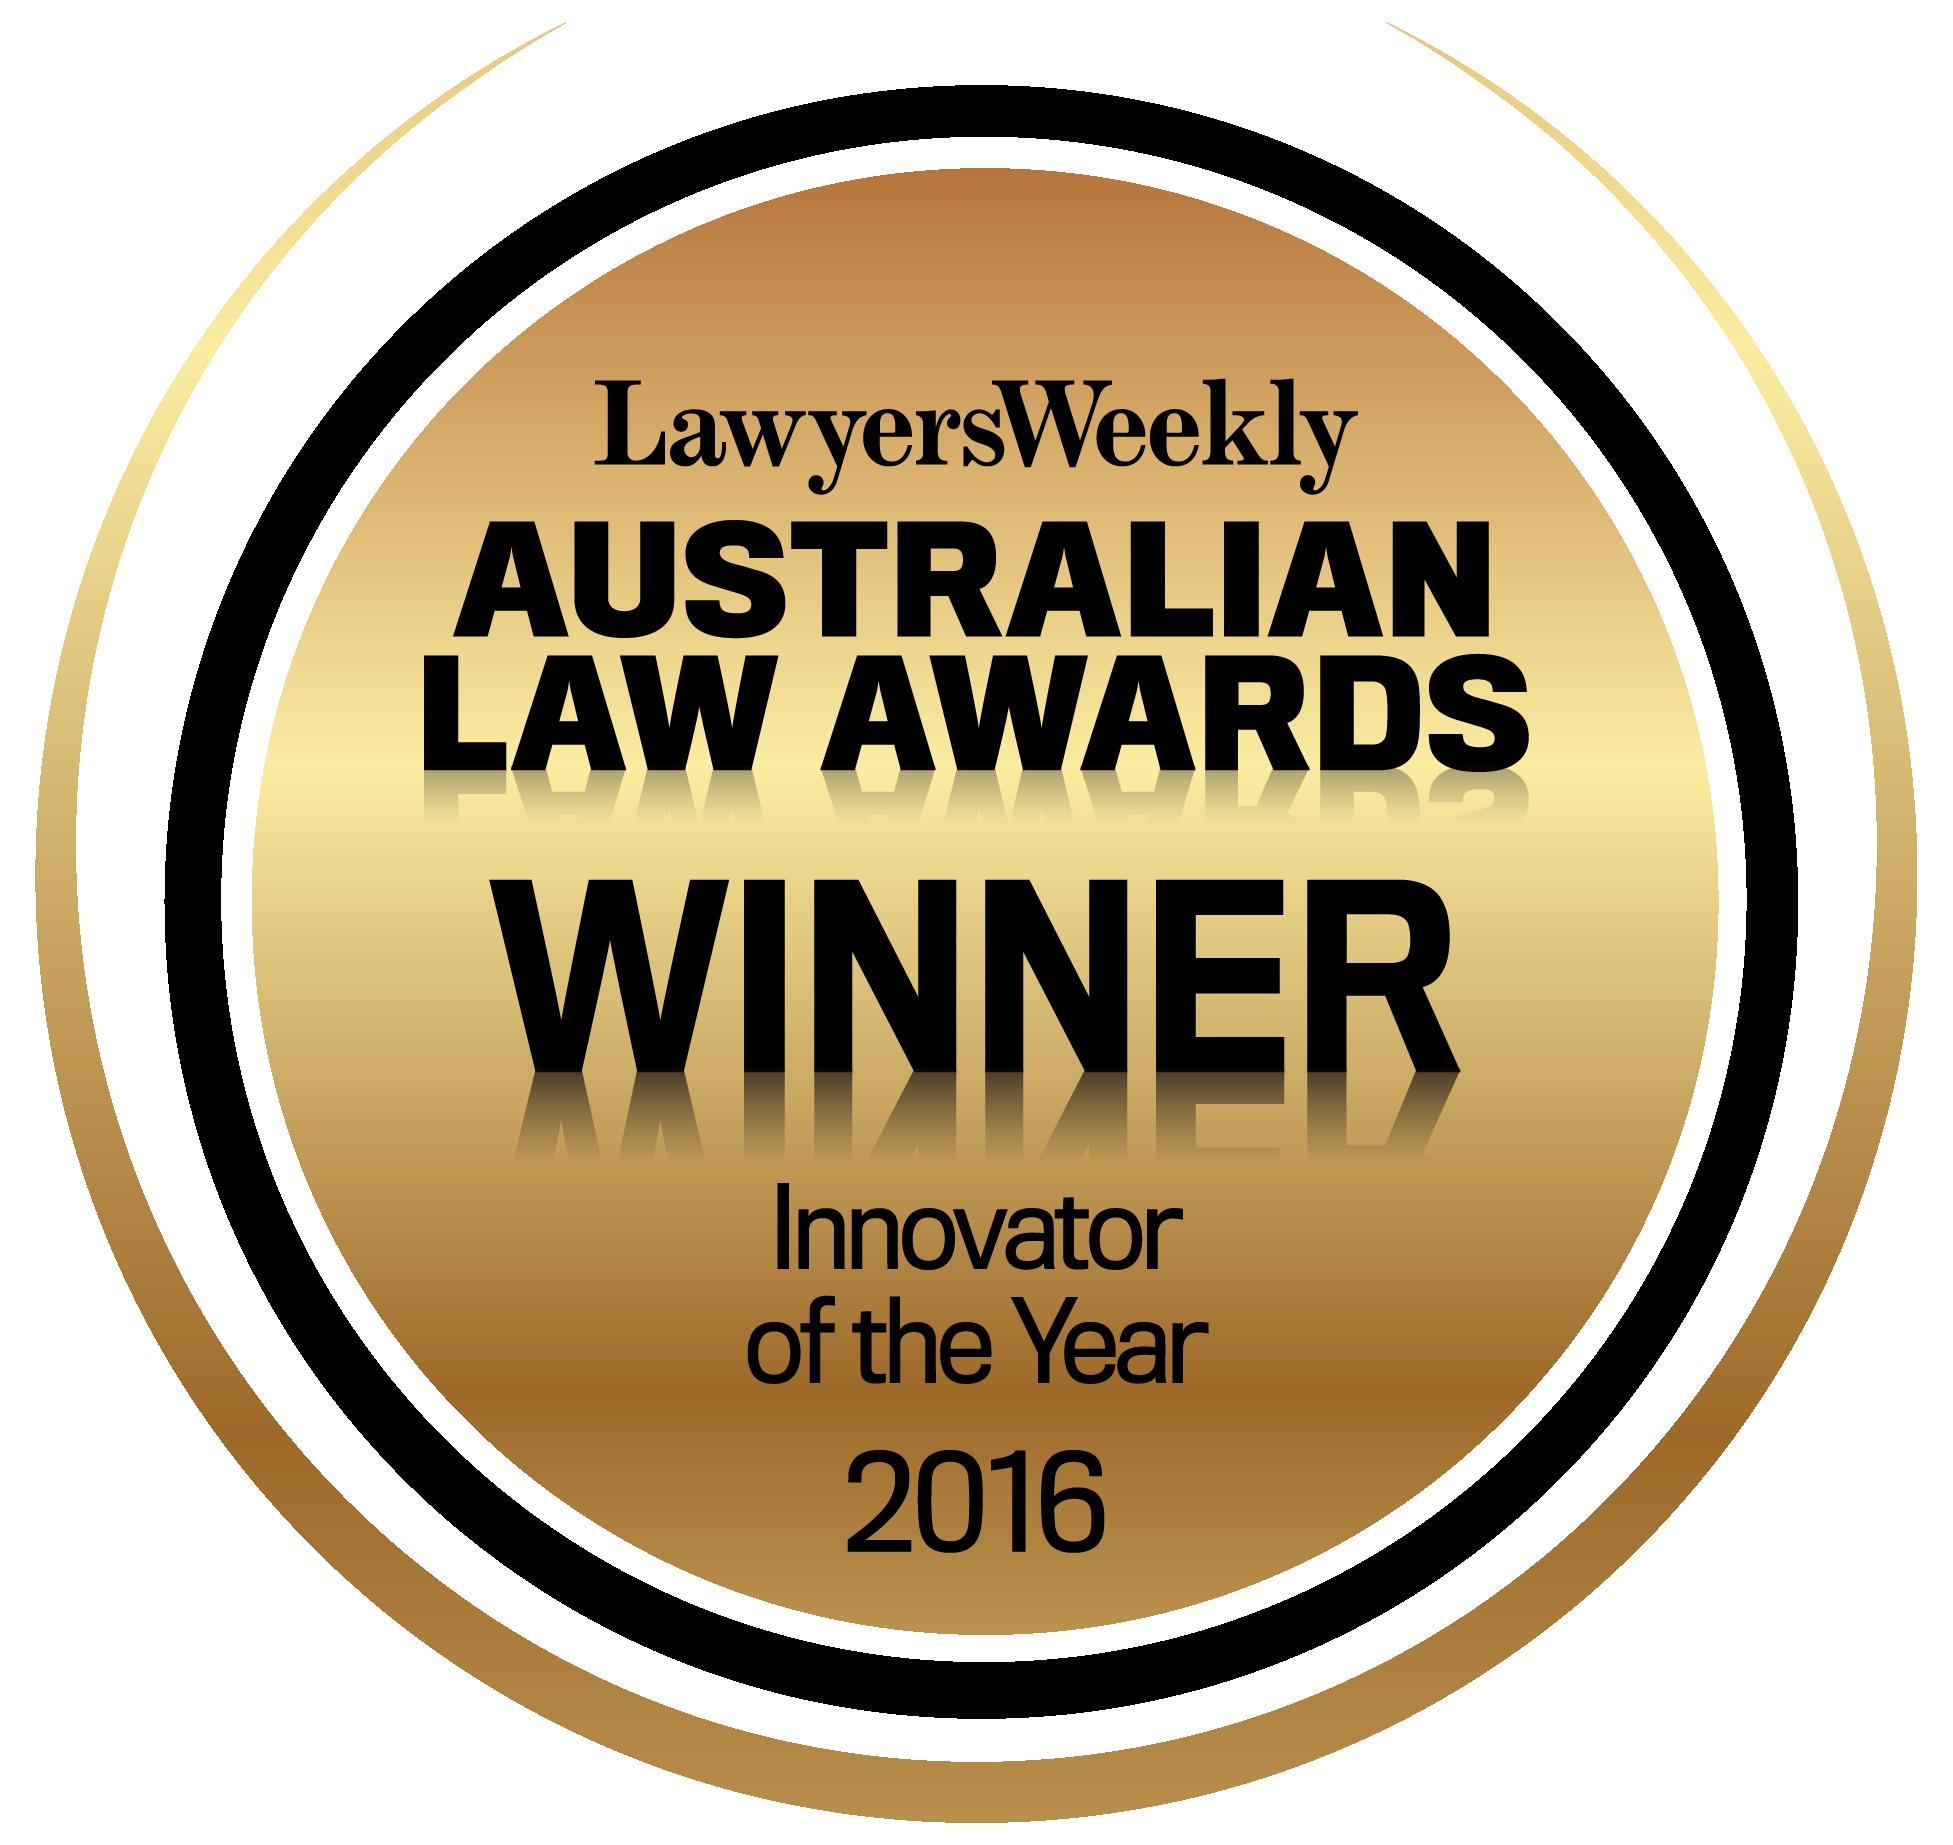 2016-winner-innovator-of-the-year